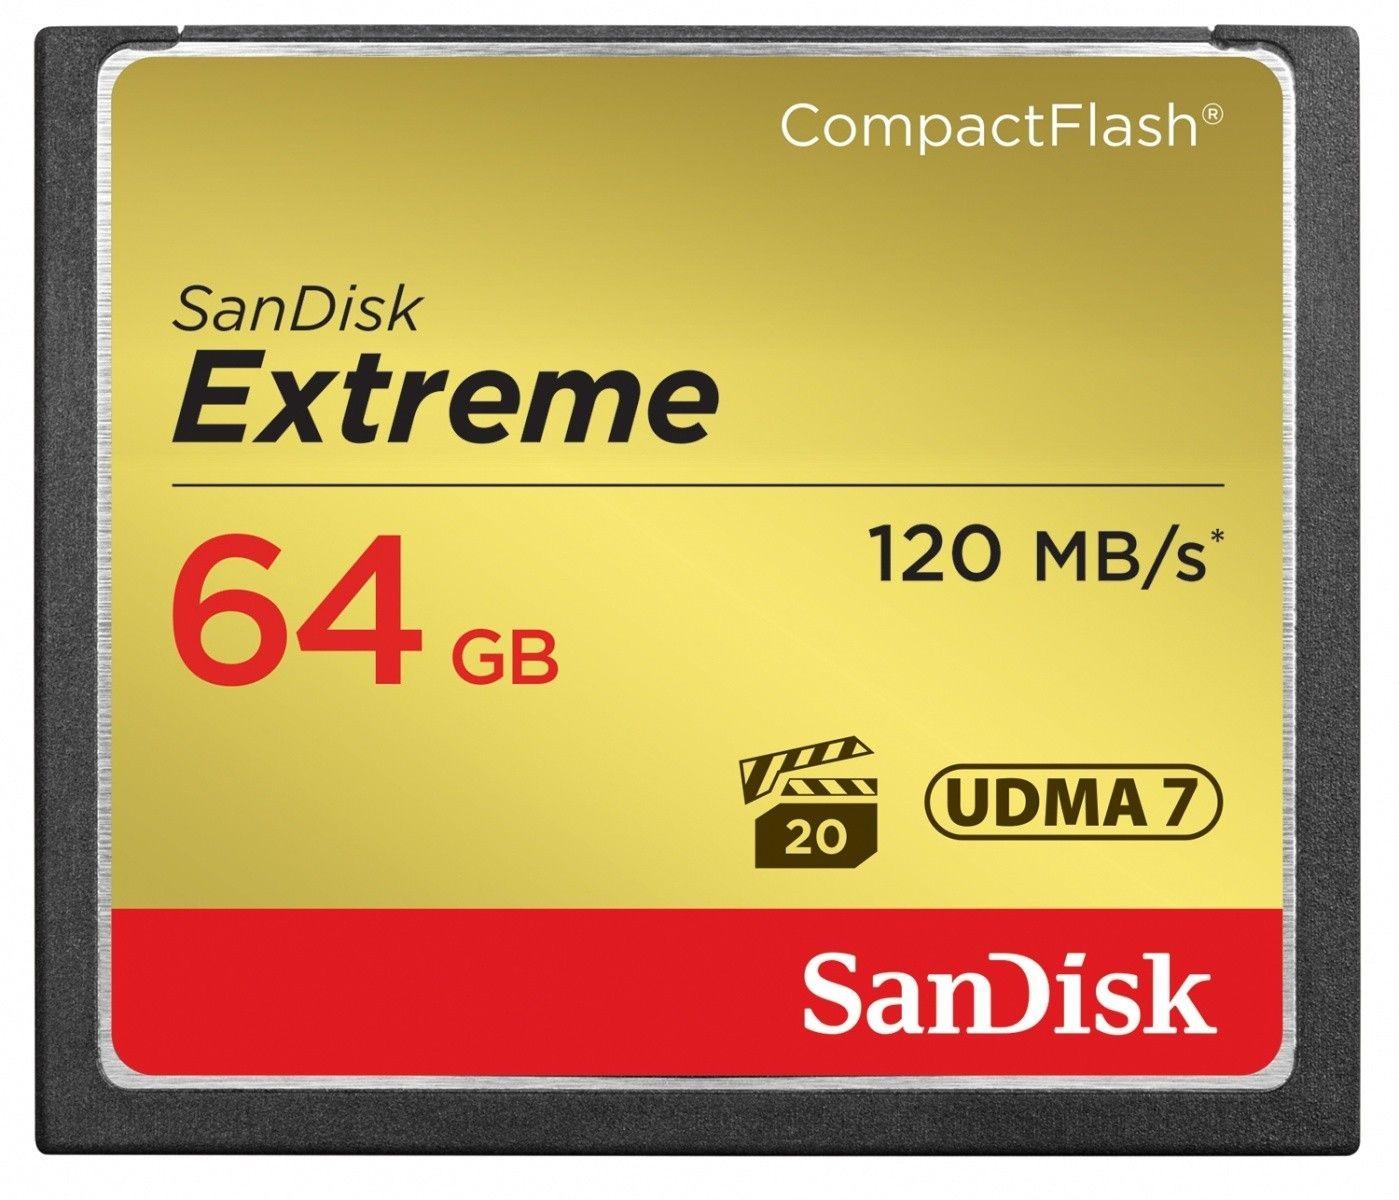 SanDisk Karta Compact Flash Extreme 64GB UDMA7 (transfer 120MB/s)